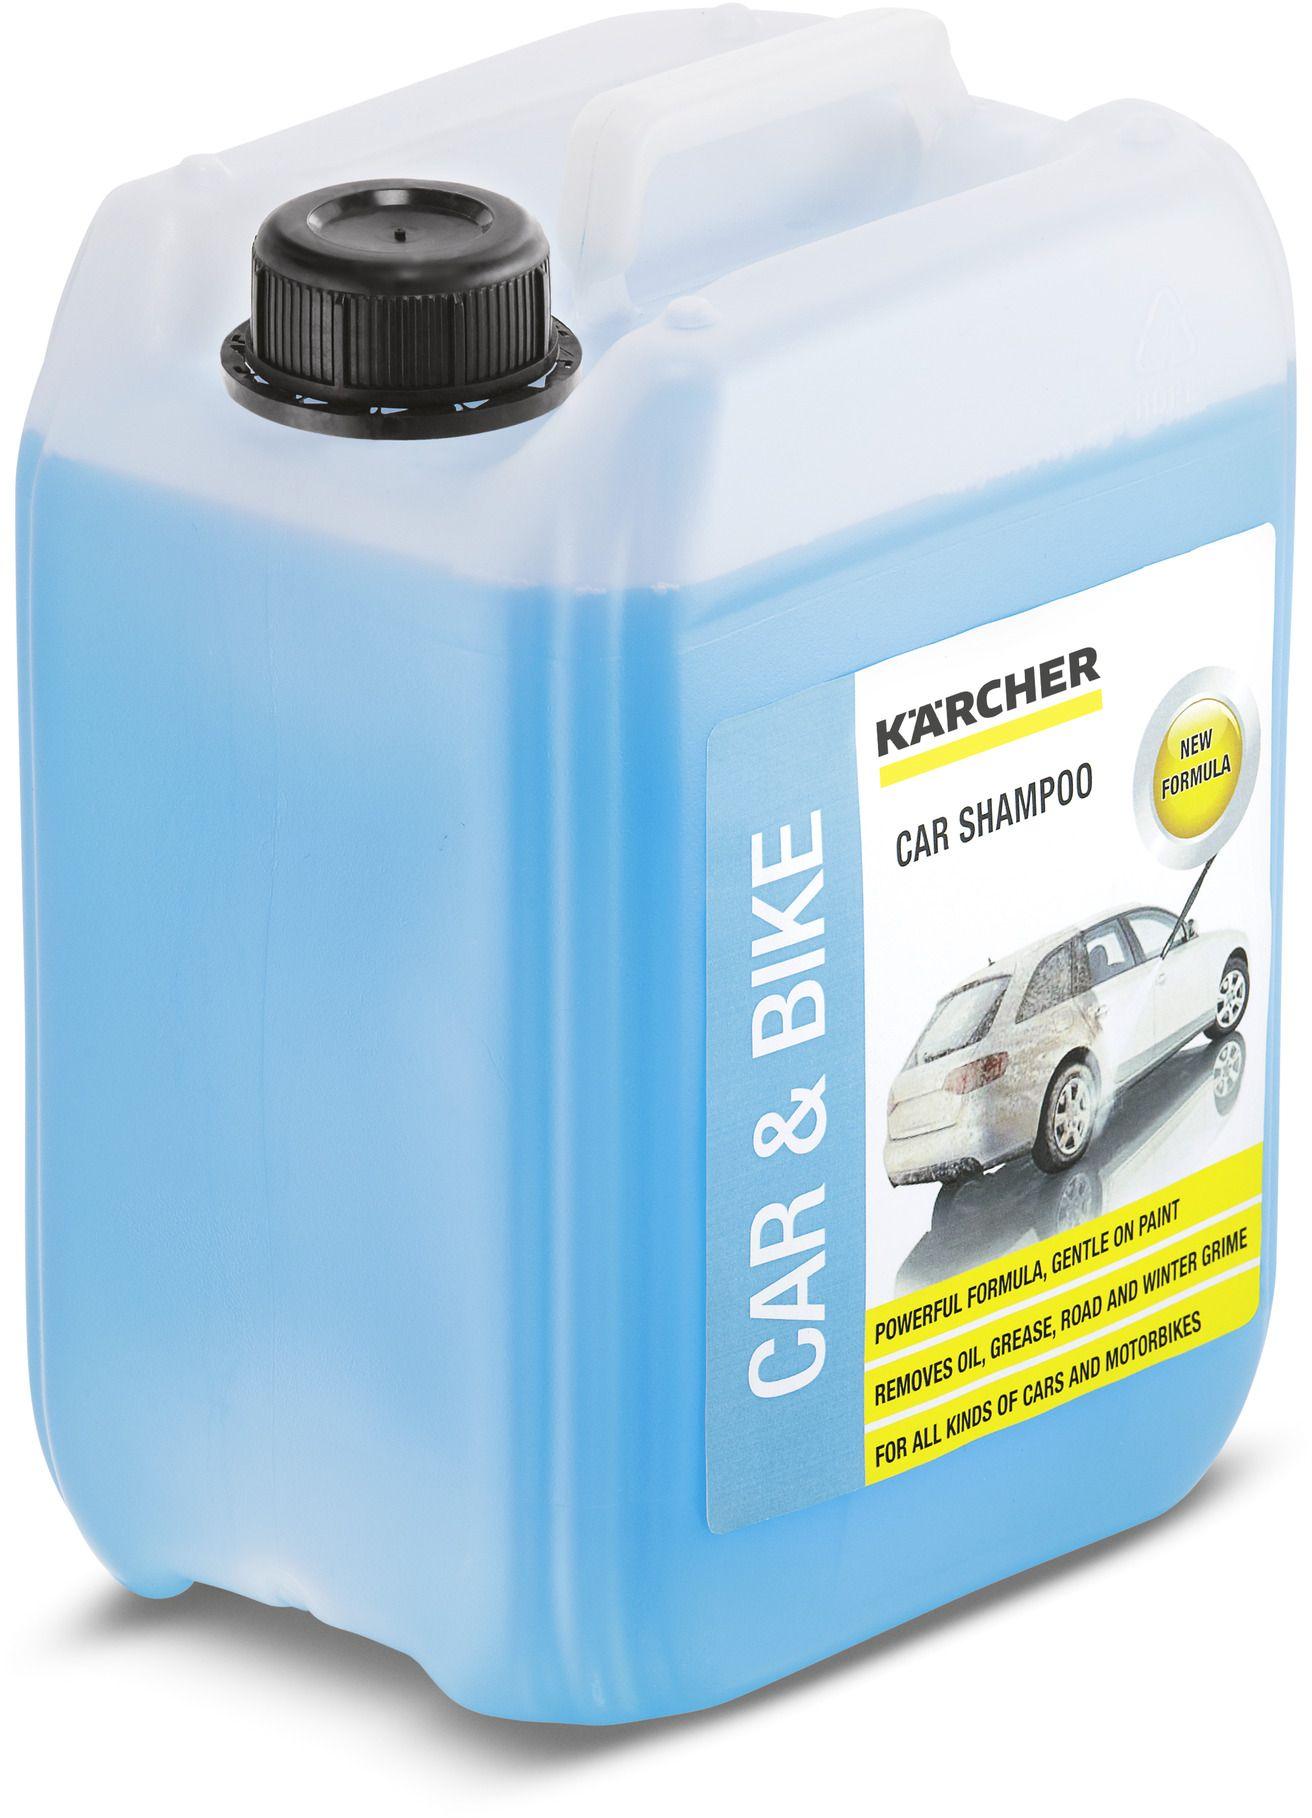 Karcher RM 565 Szampon samochodowy 5L (6.295-360.0) tīrīšanas līdzeklis